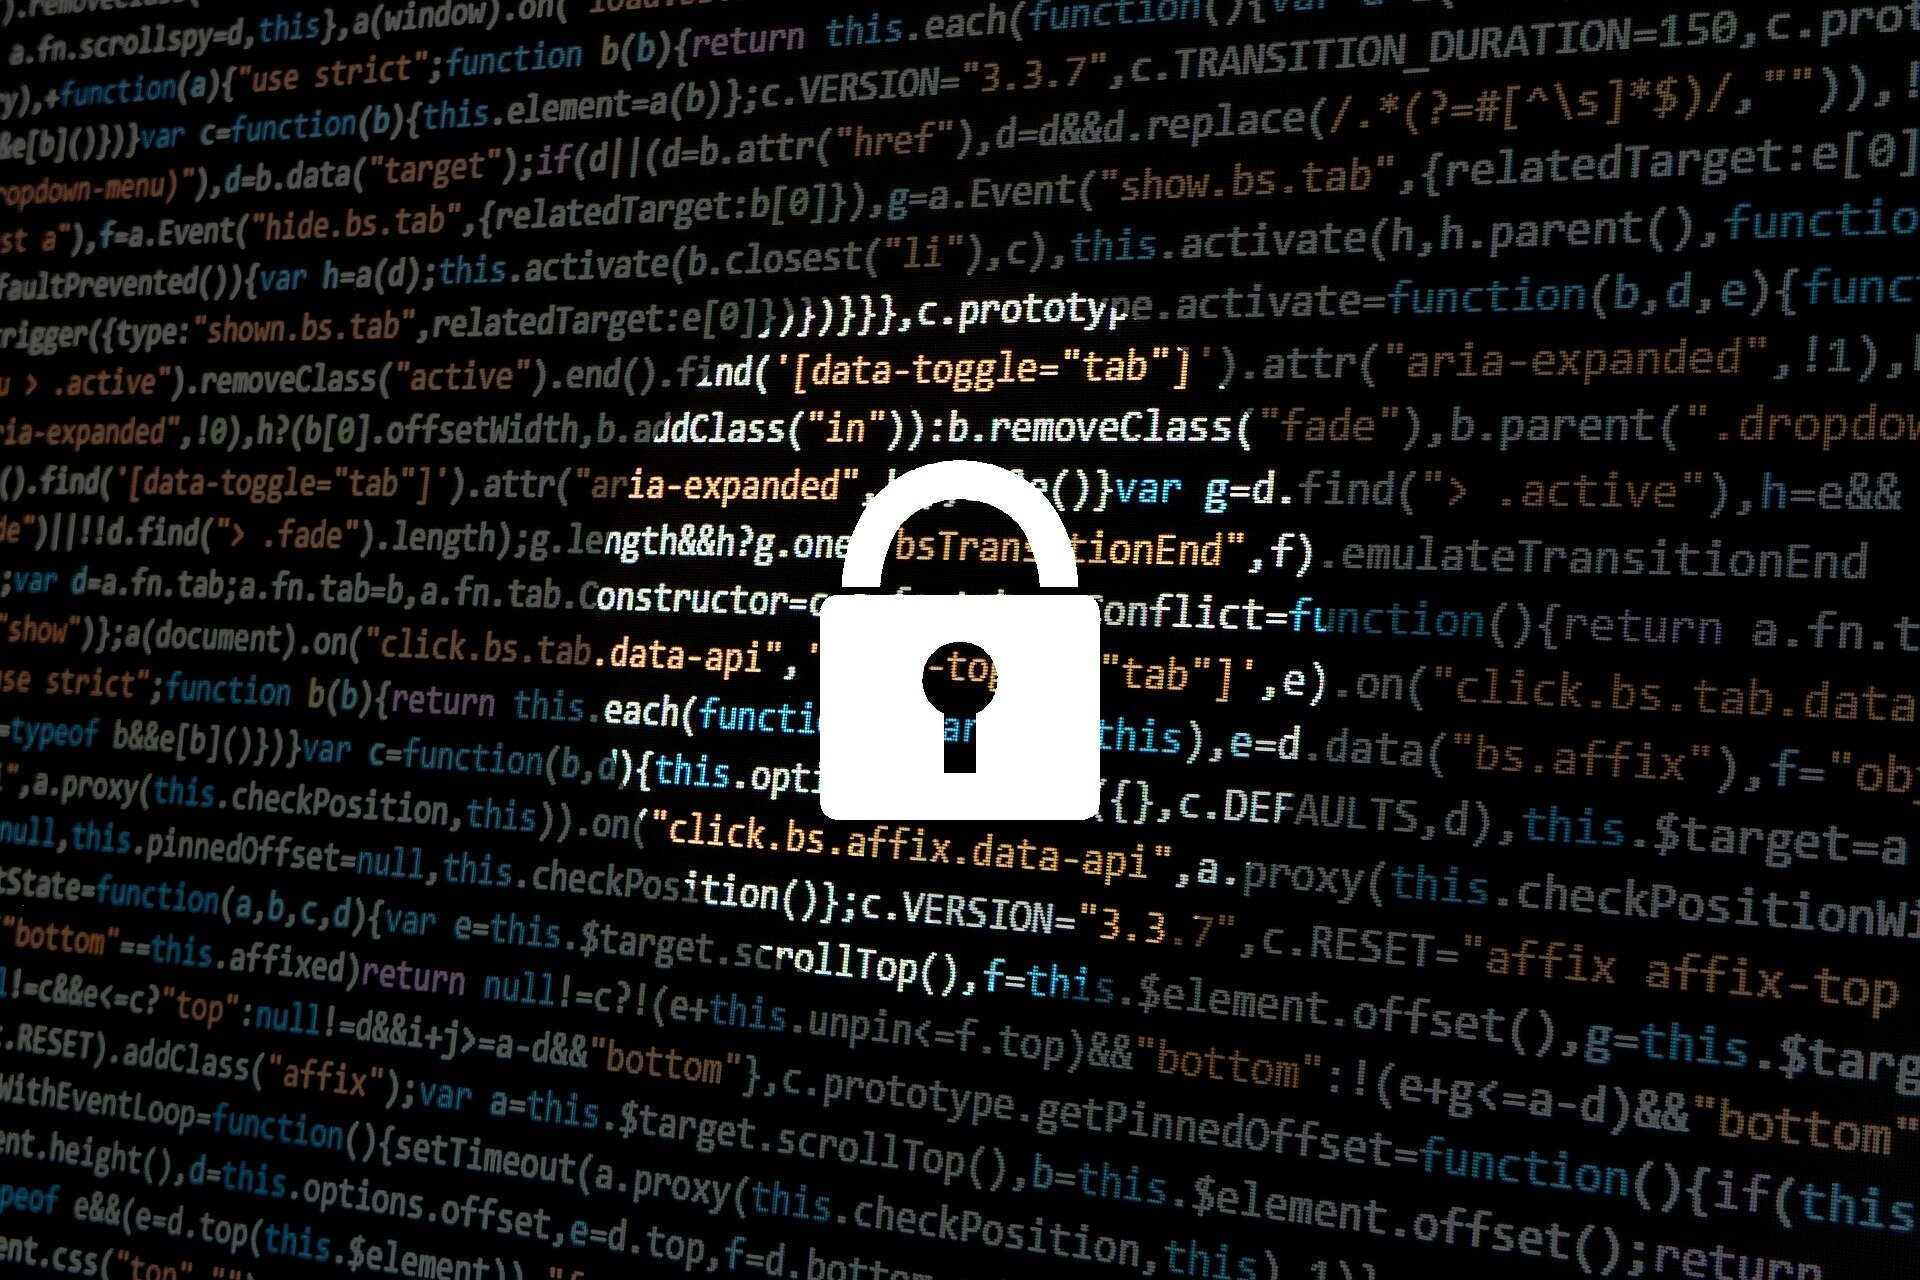 Cybersecurity, Tech Infrastructure Requires International Trust